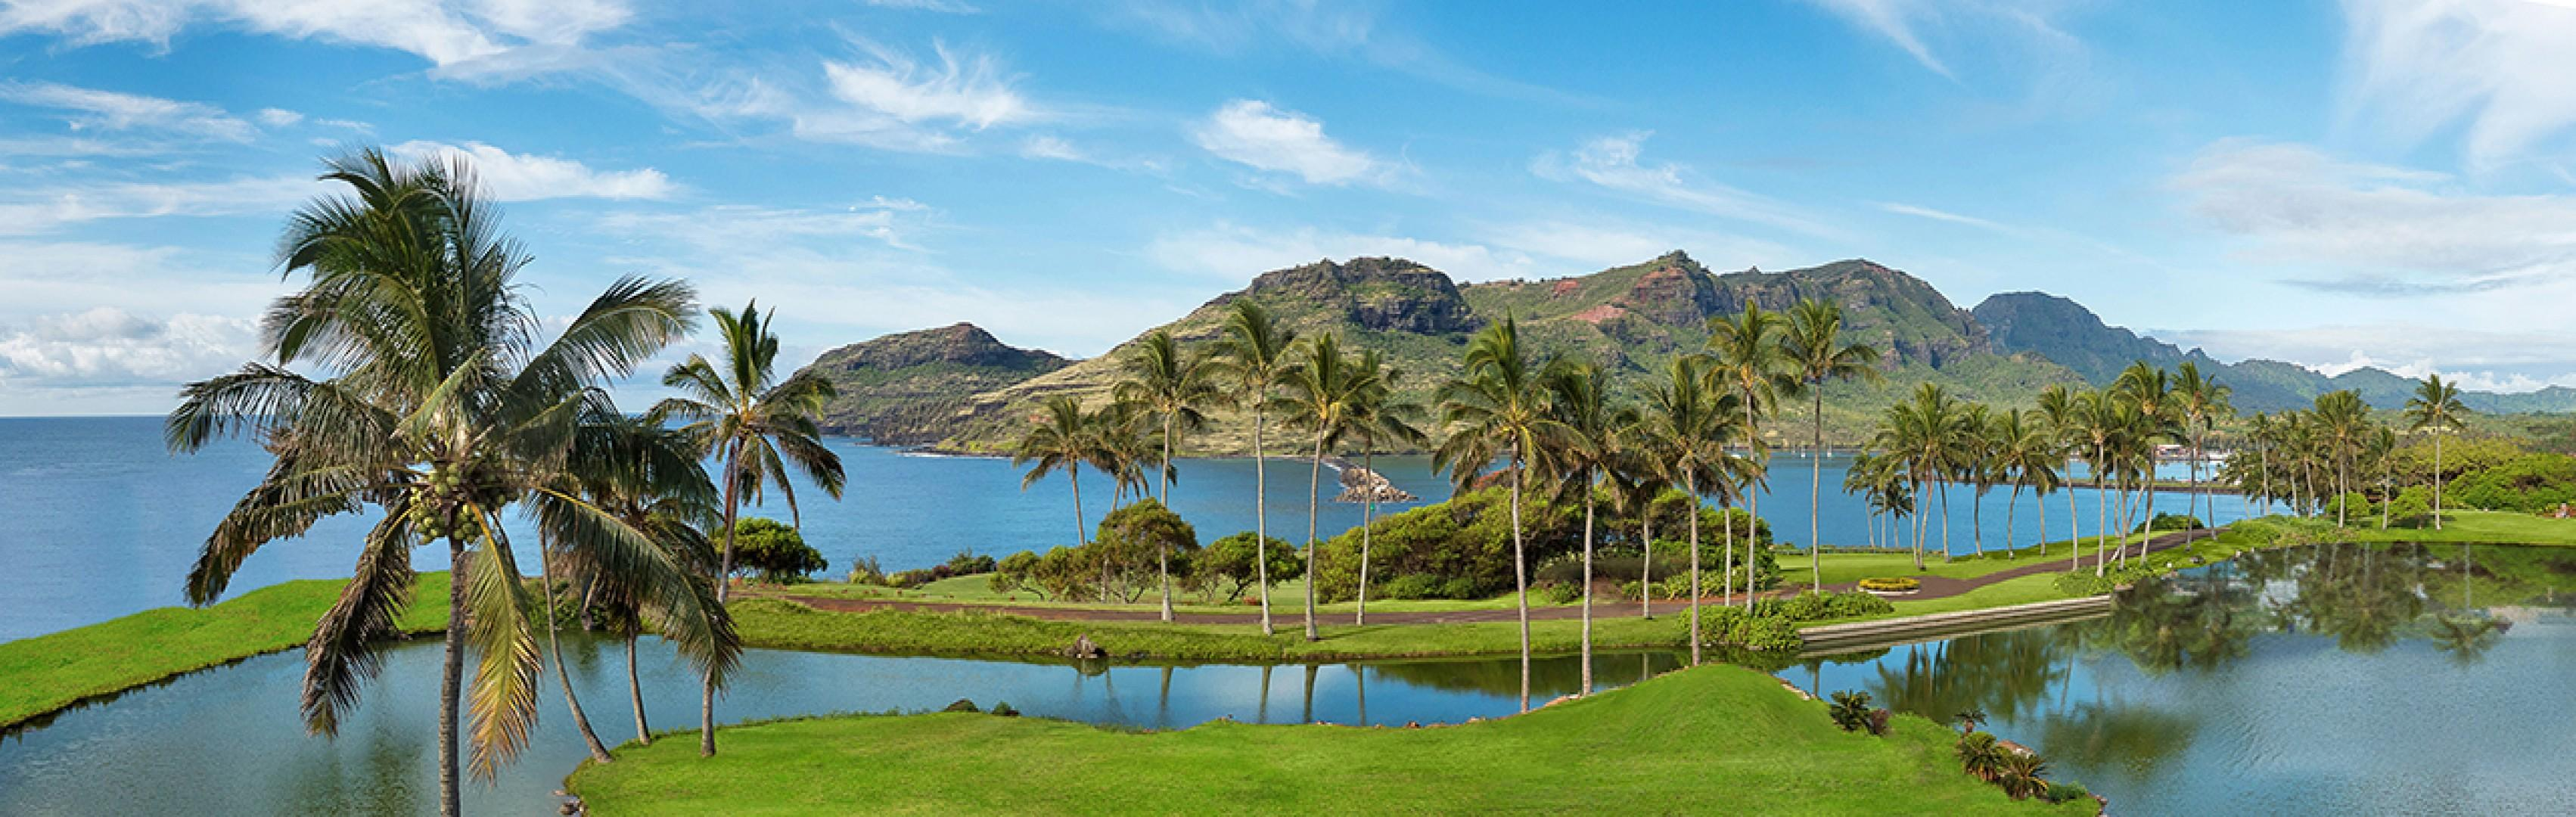 Hokuala is the premier golf resort on Kauai.